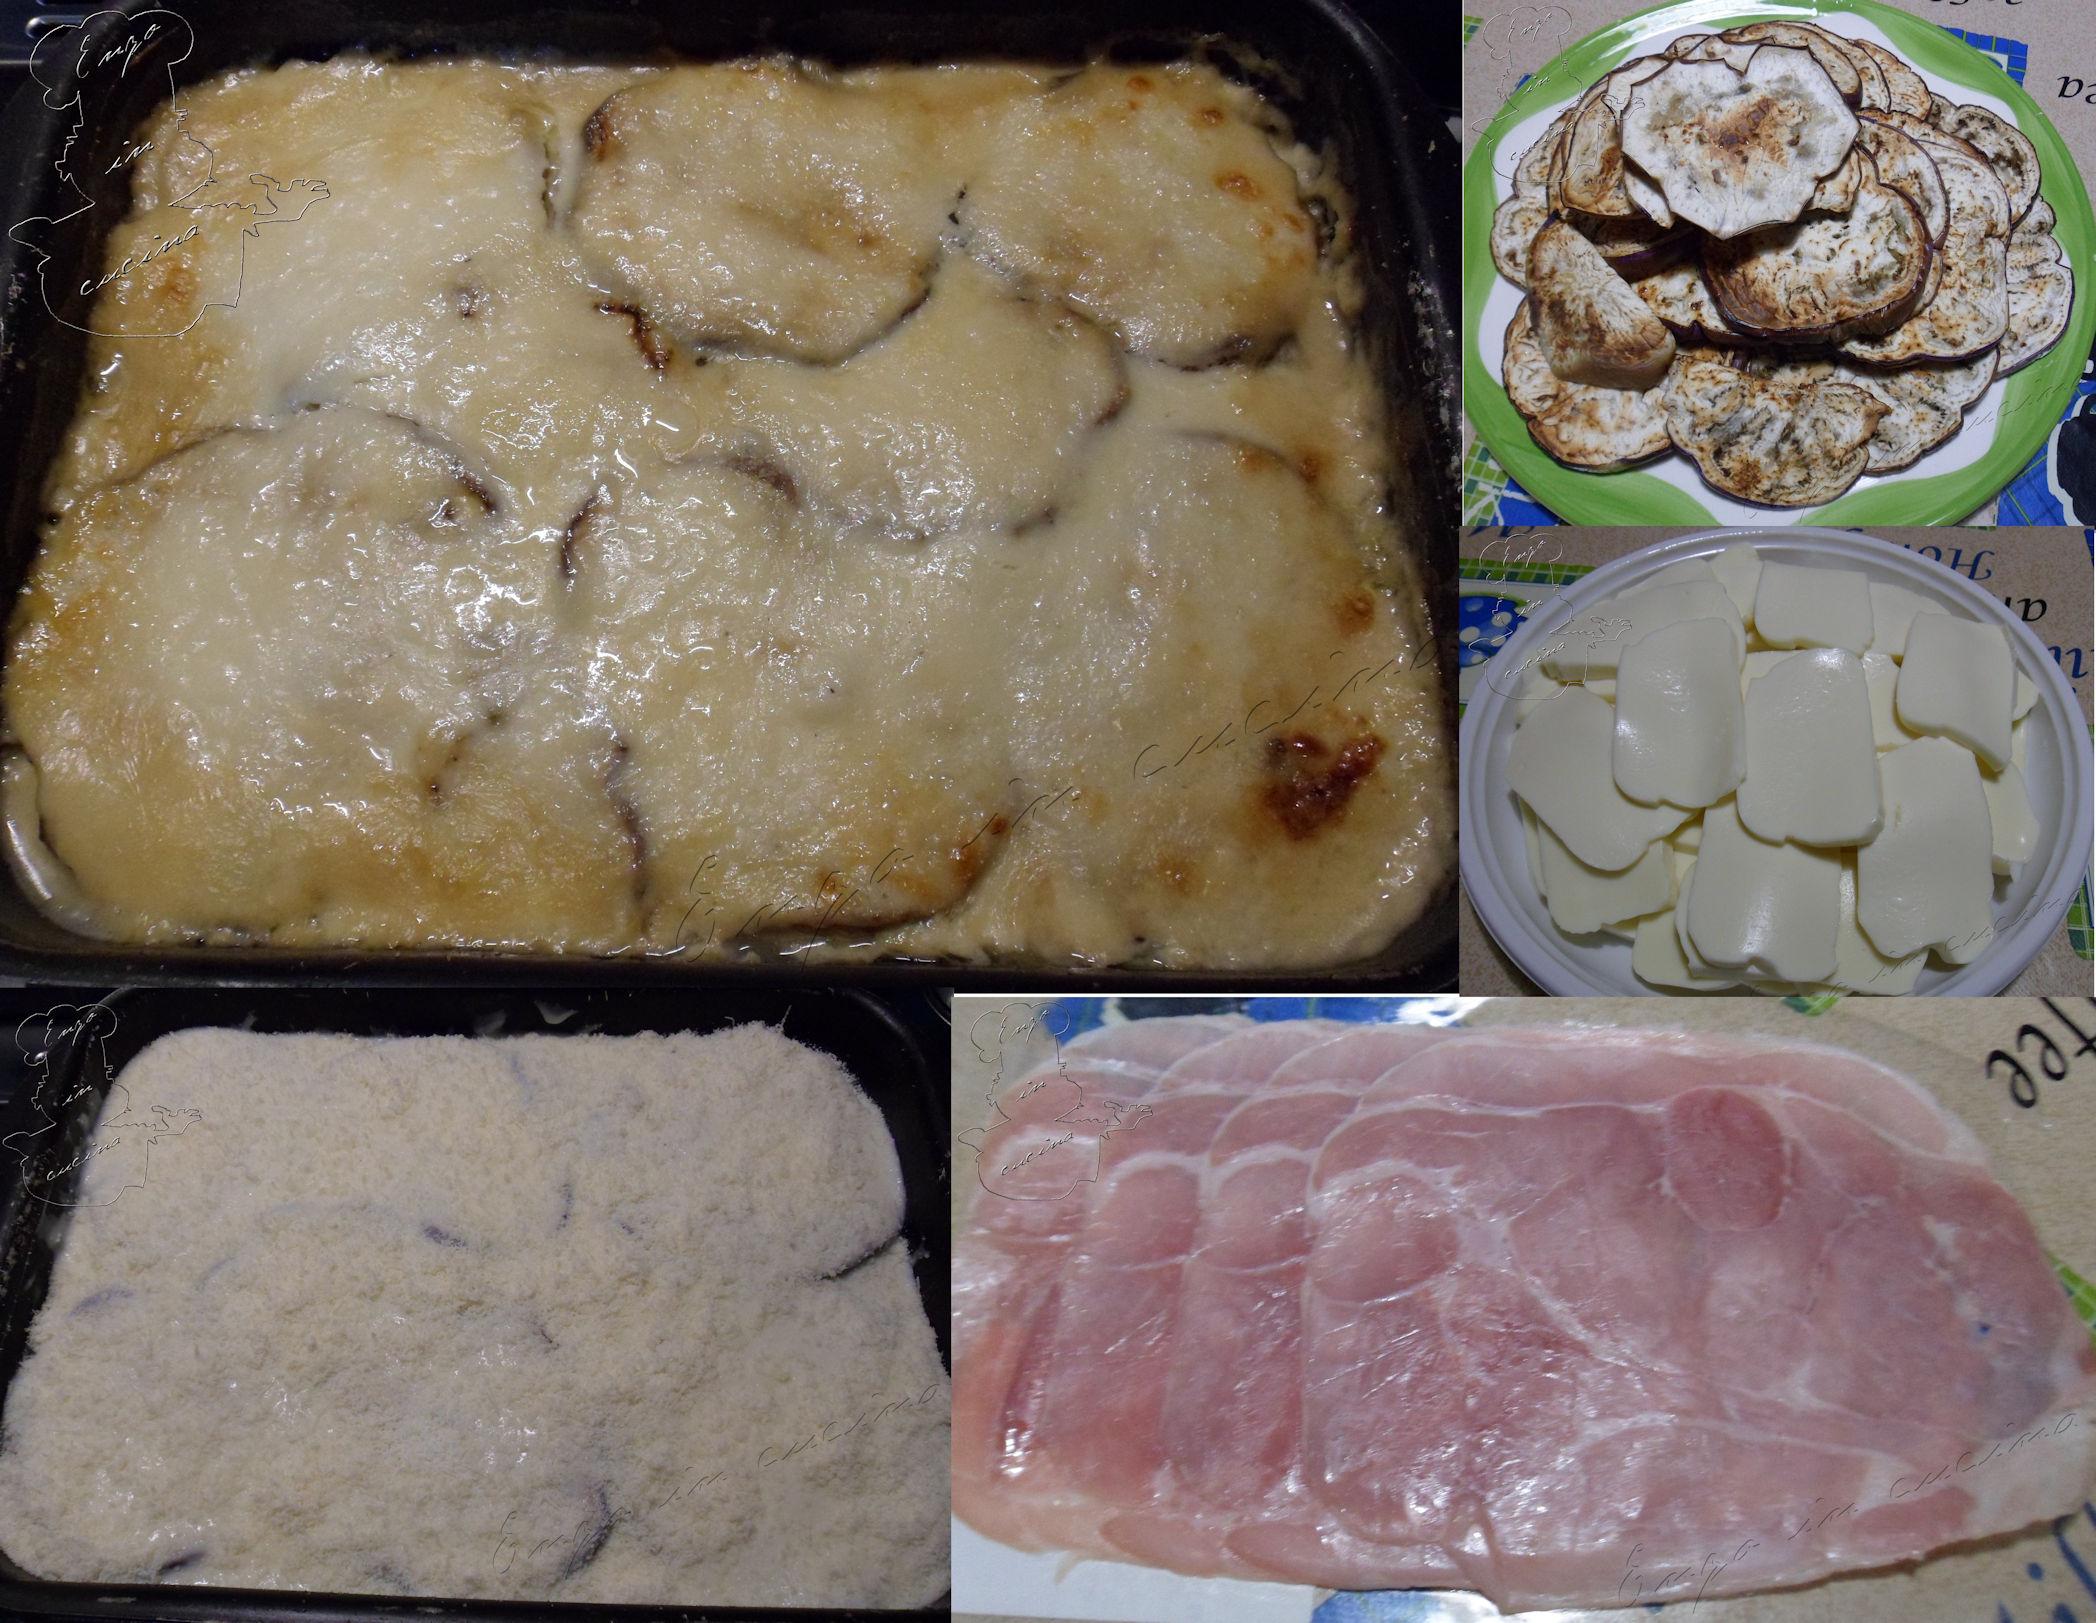 Parmigiana bianca di melanzane arrostite | Enzo in cucina